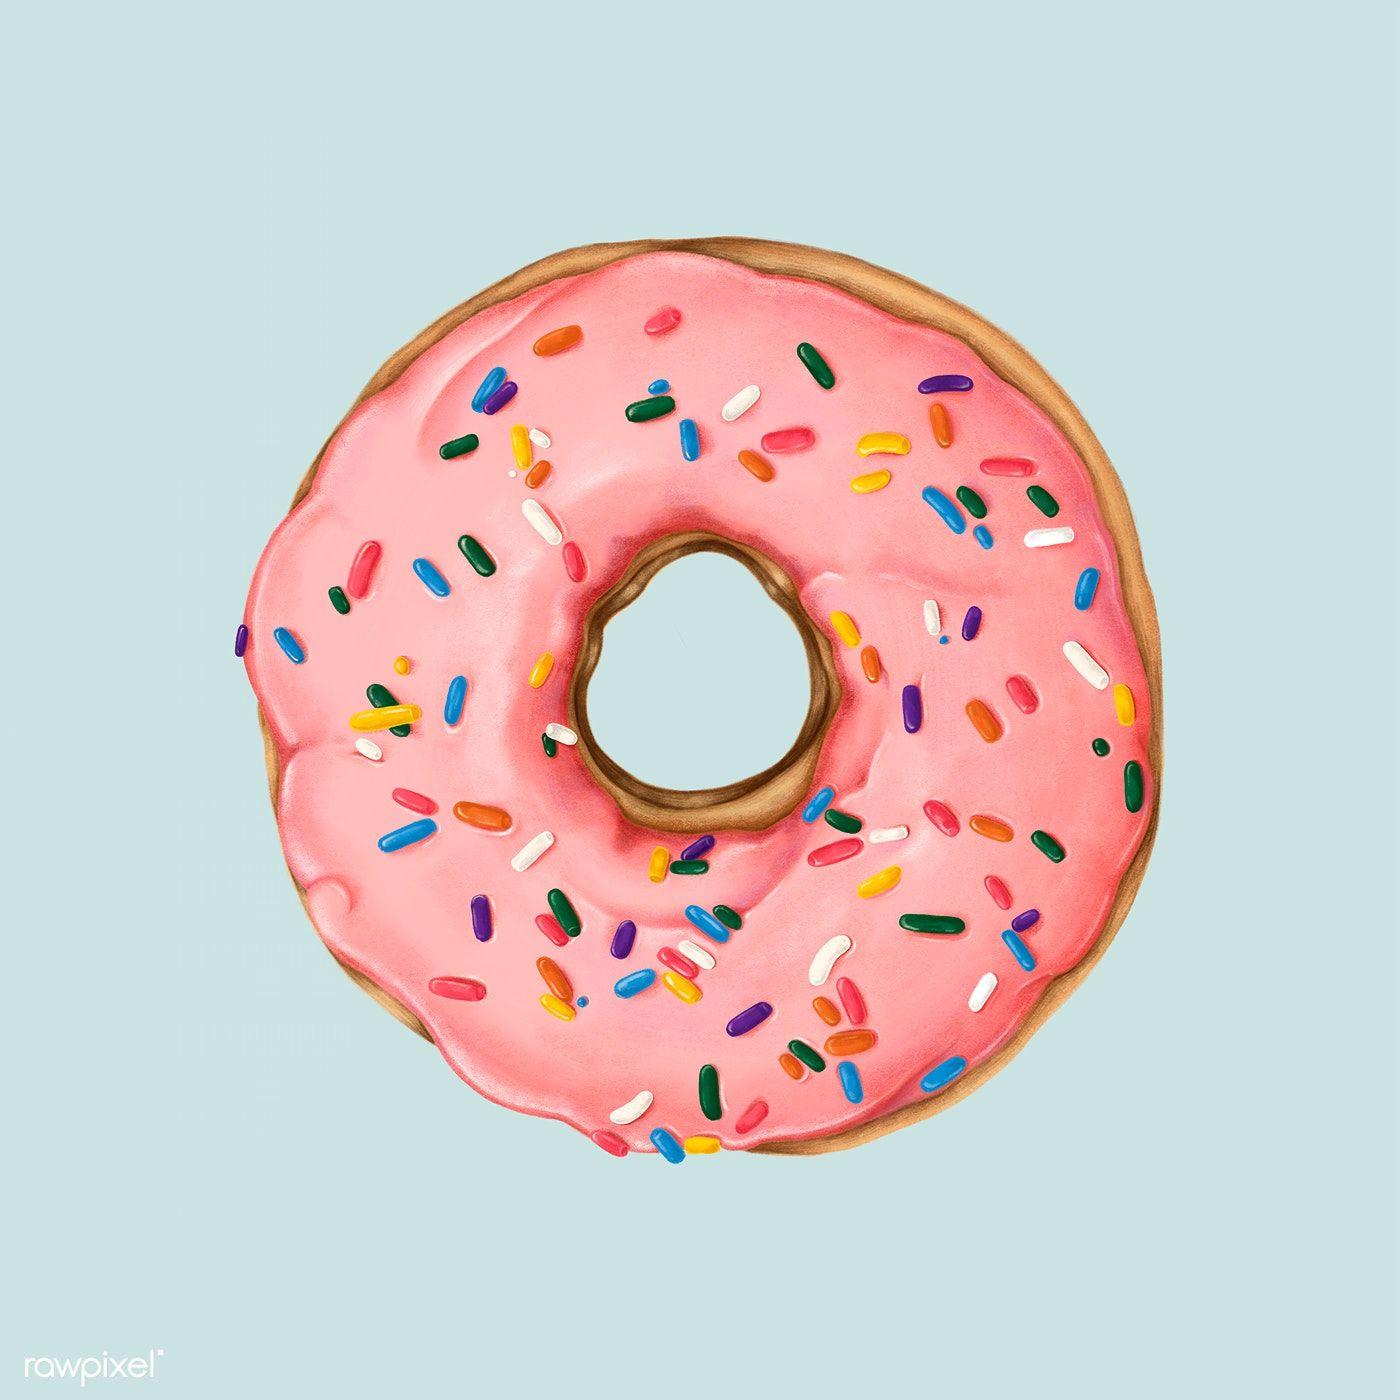 Hand drawn pink doughnut mockup free image by rawpixel